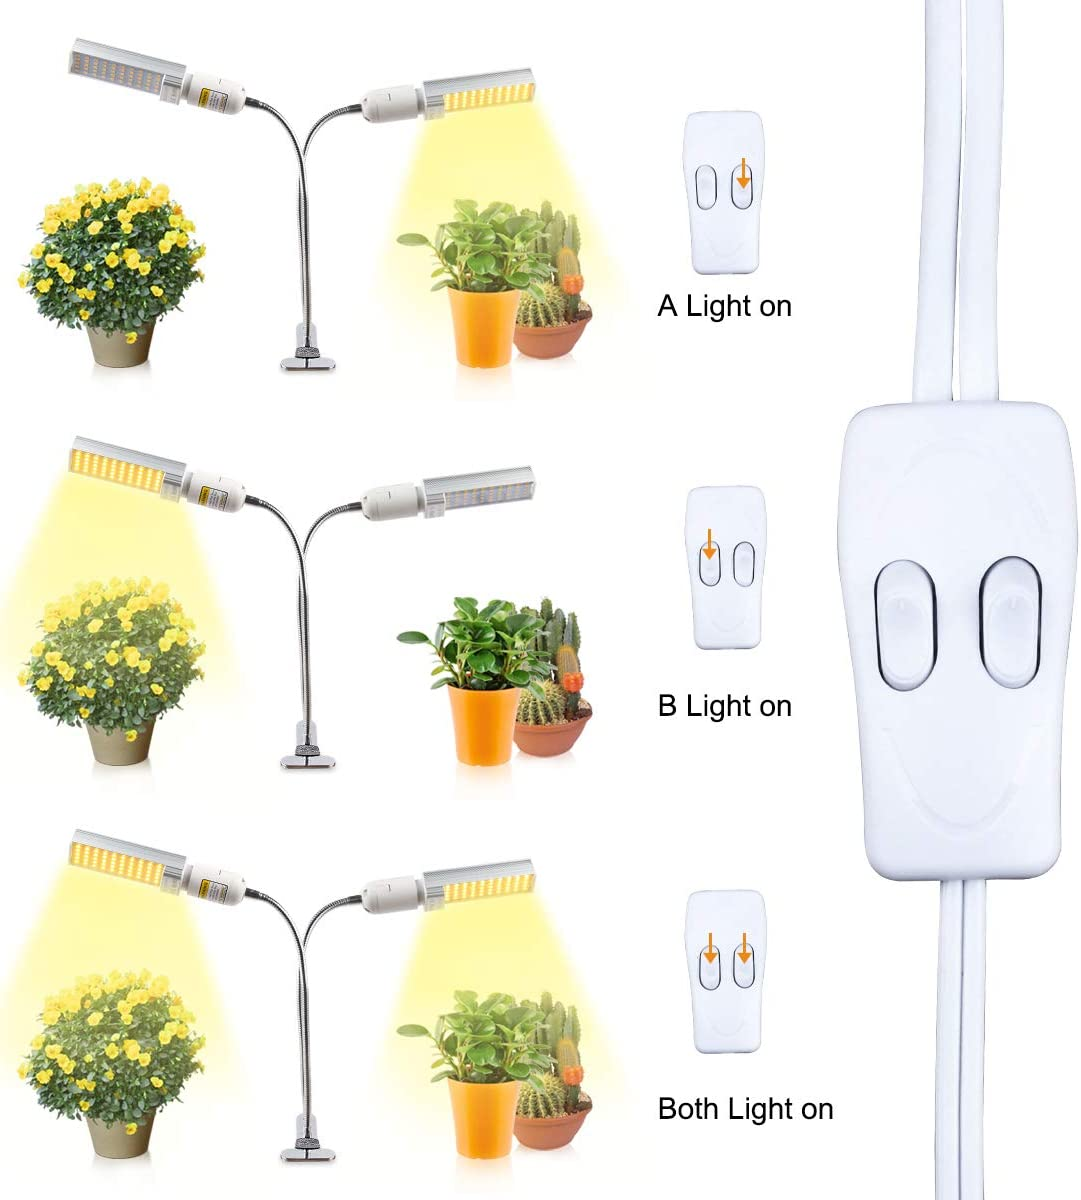 LED Sunlike Full Spectrum Plant Growing Lamp for Seedling Blooming Fruiting JEVDES LED Grow Light 100W Plant Light for Indoor Plants